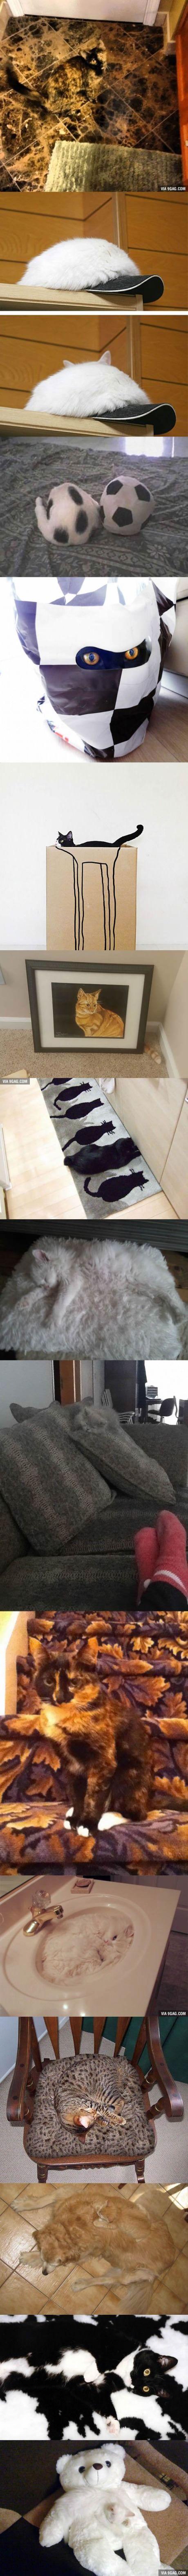 I don't see any cats... Oh wait http://amzn.to/2qVpaTc